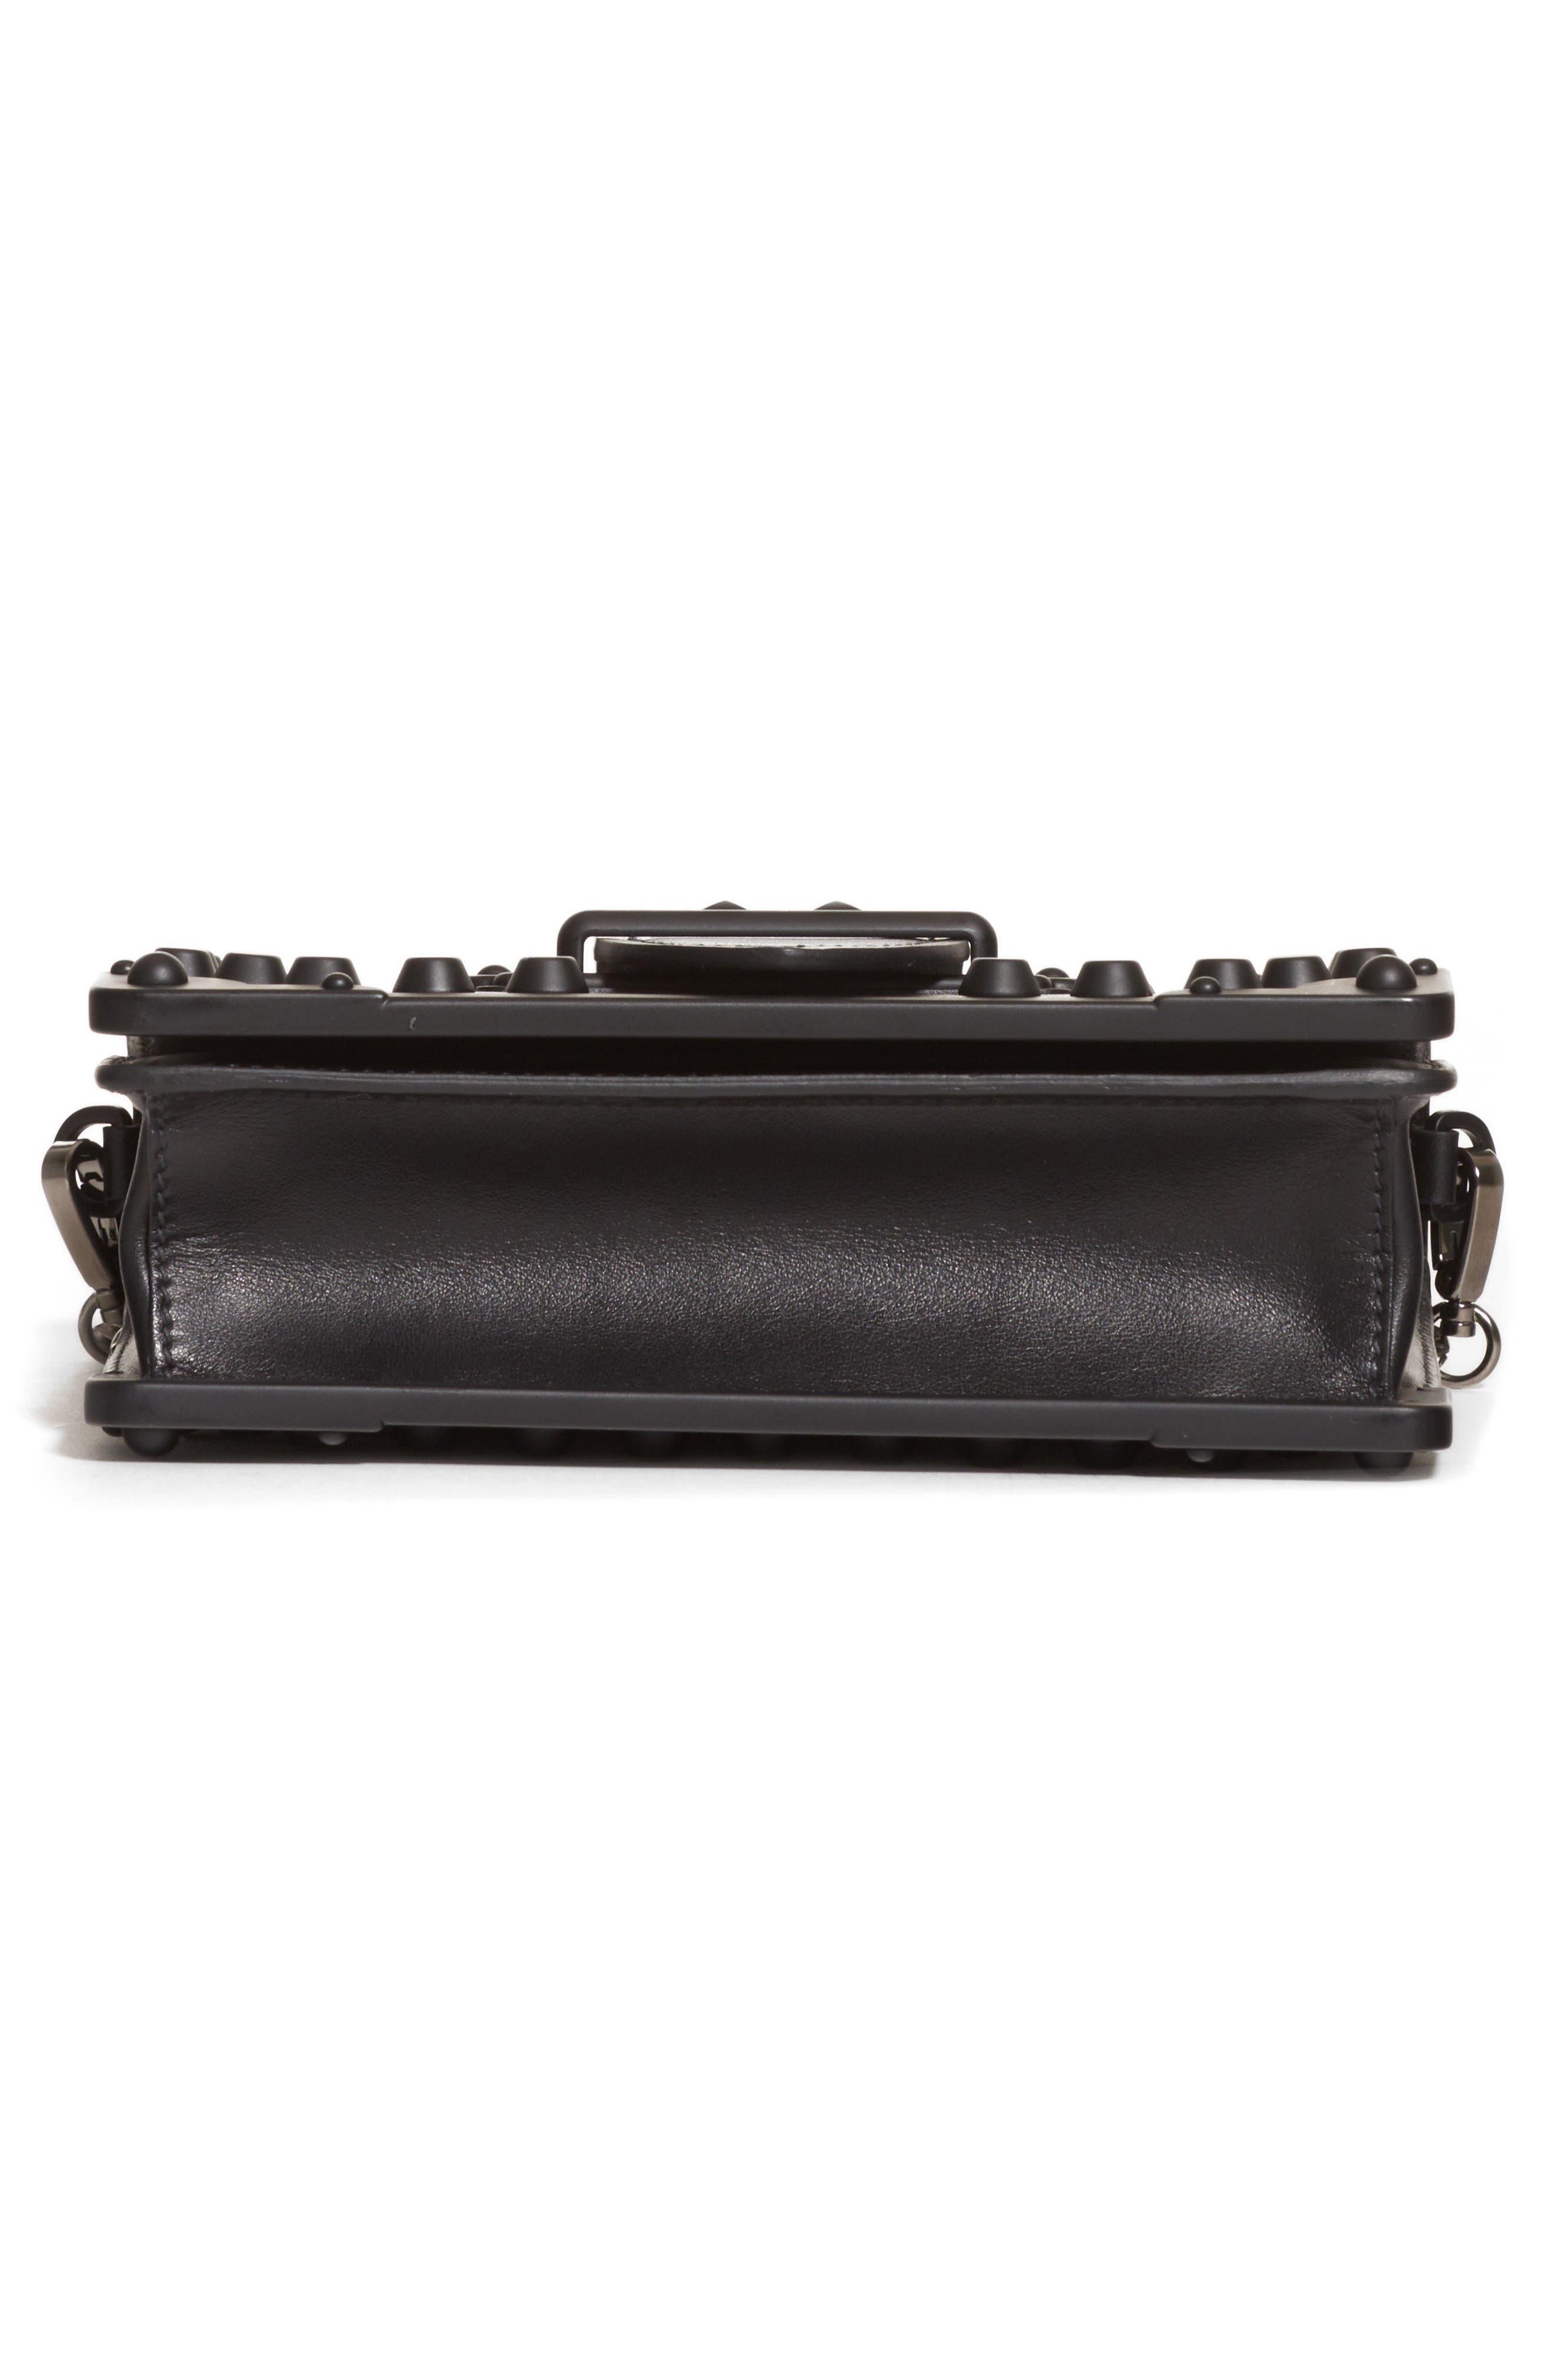 PRADA,                             Cahier Studded Leather Crossbody Bag,                             Alternate thumbnail 5, color,                             NERO/ NERO